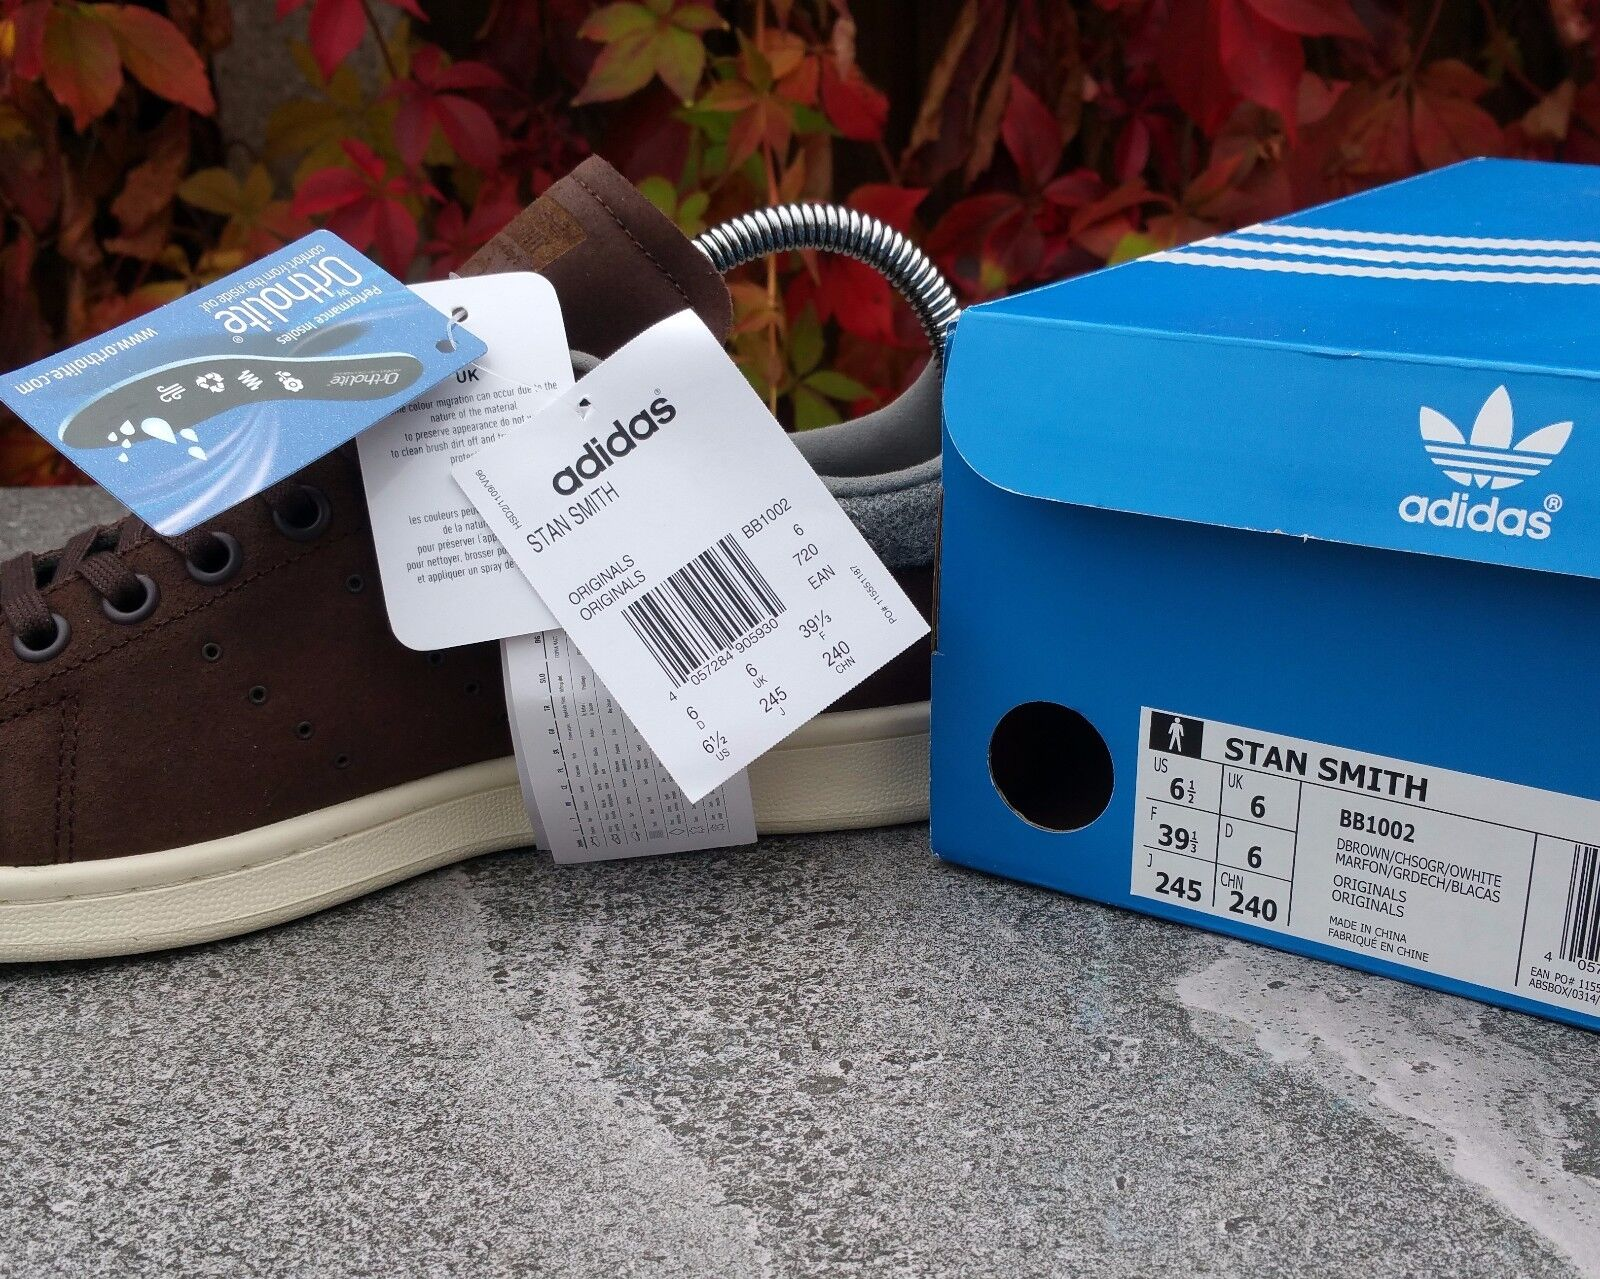 BNWB & Authentic Adidas Originals Stan UK Smith Winter ® Trainers UK Stan Size 6 cfc942